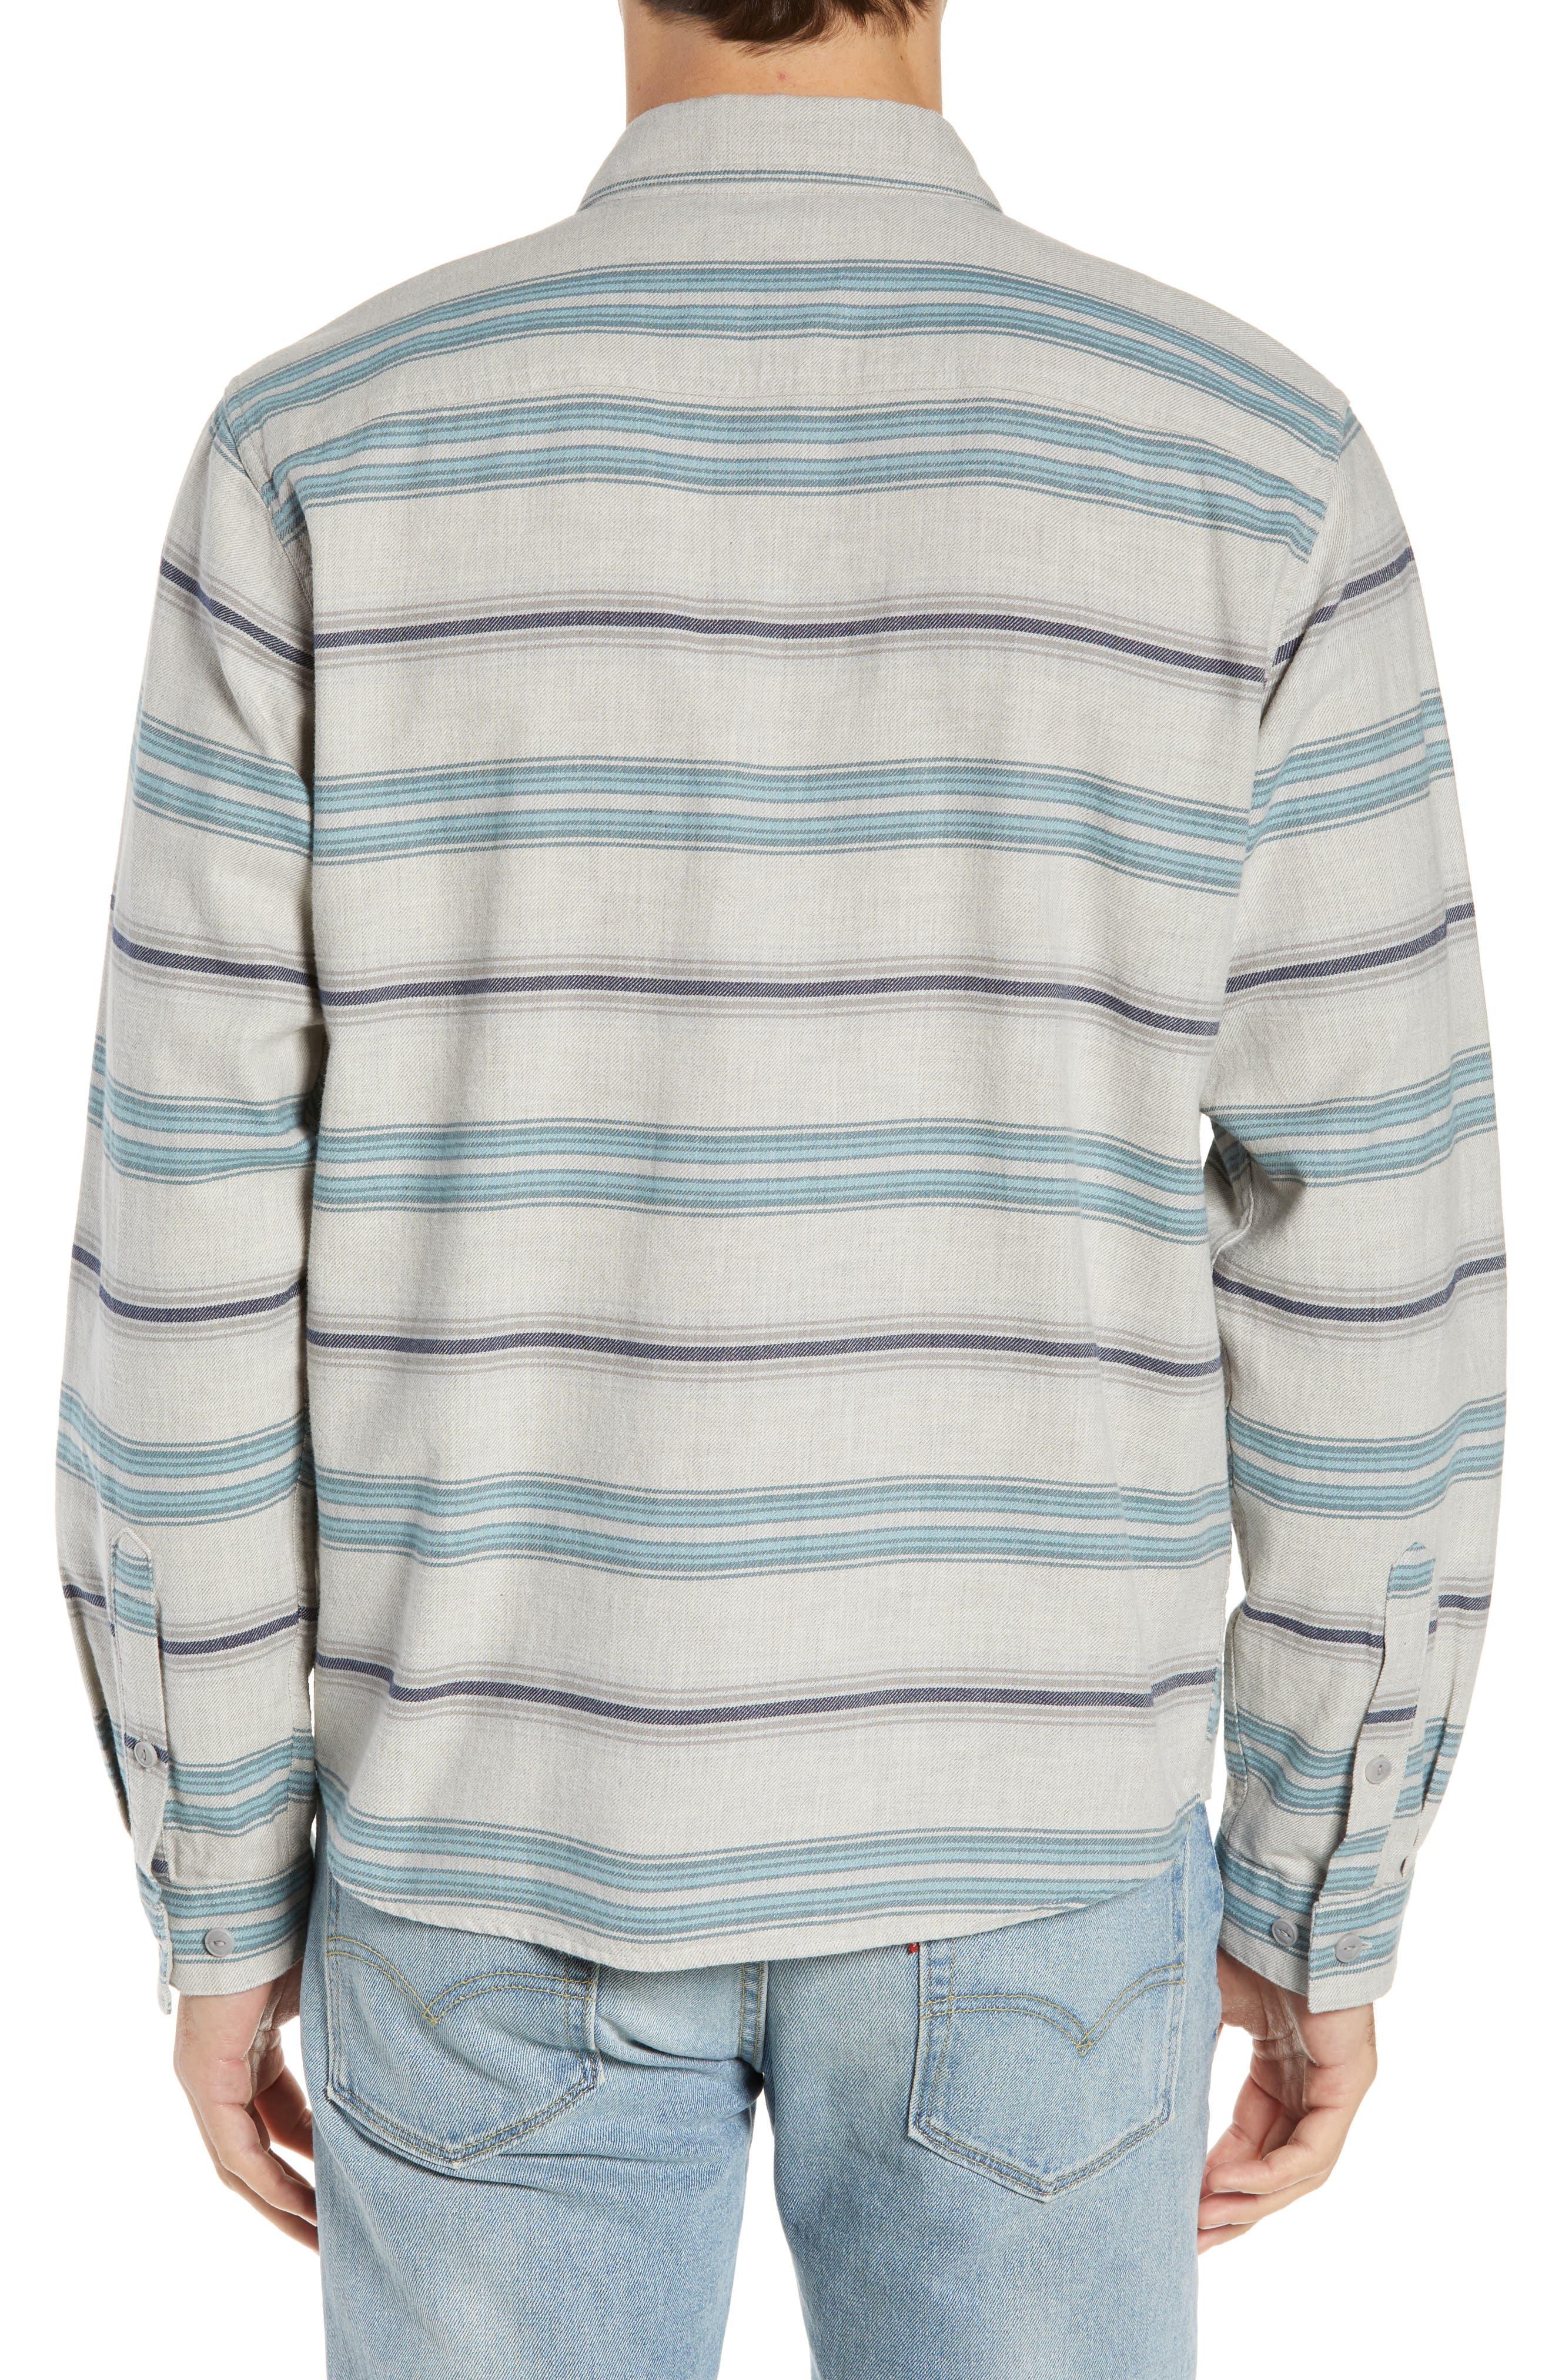 PATAGONIA,                             Regular Fit Organic Cotton Flannel Shirt,                             Alternate thumbnail 3, color,                             TARKINE STRIPE DRIFTER GREY